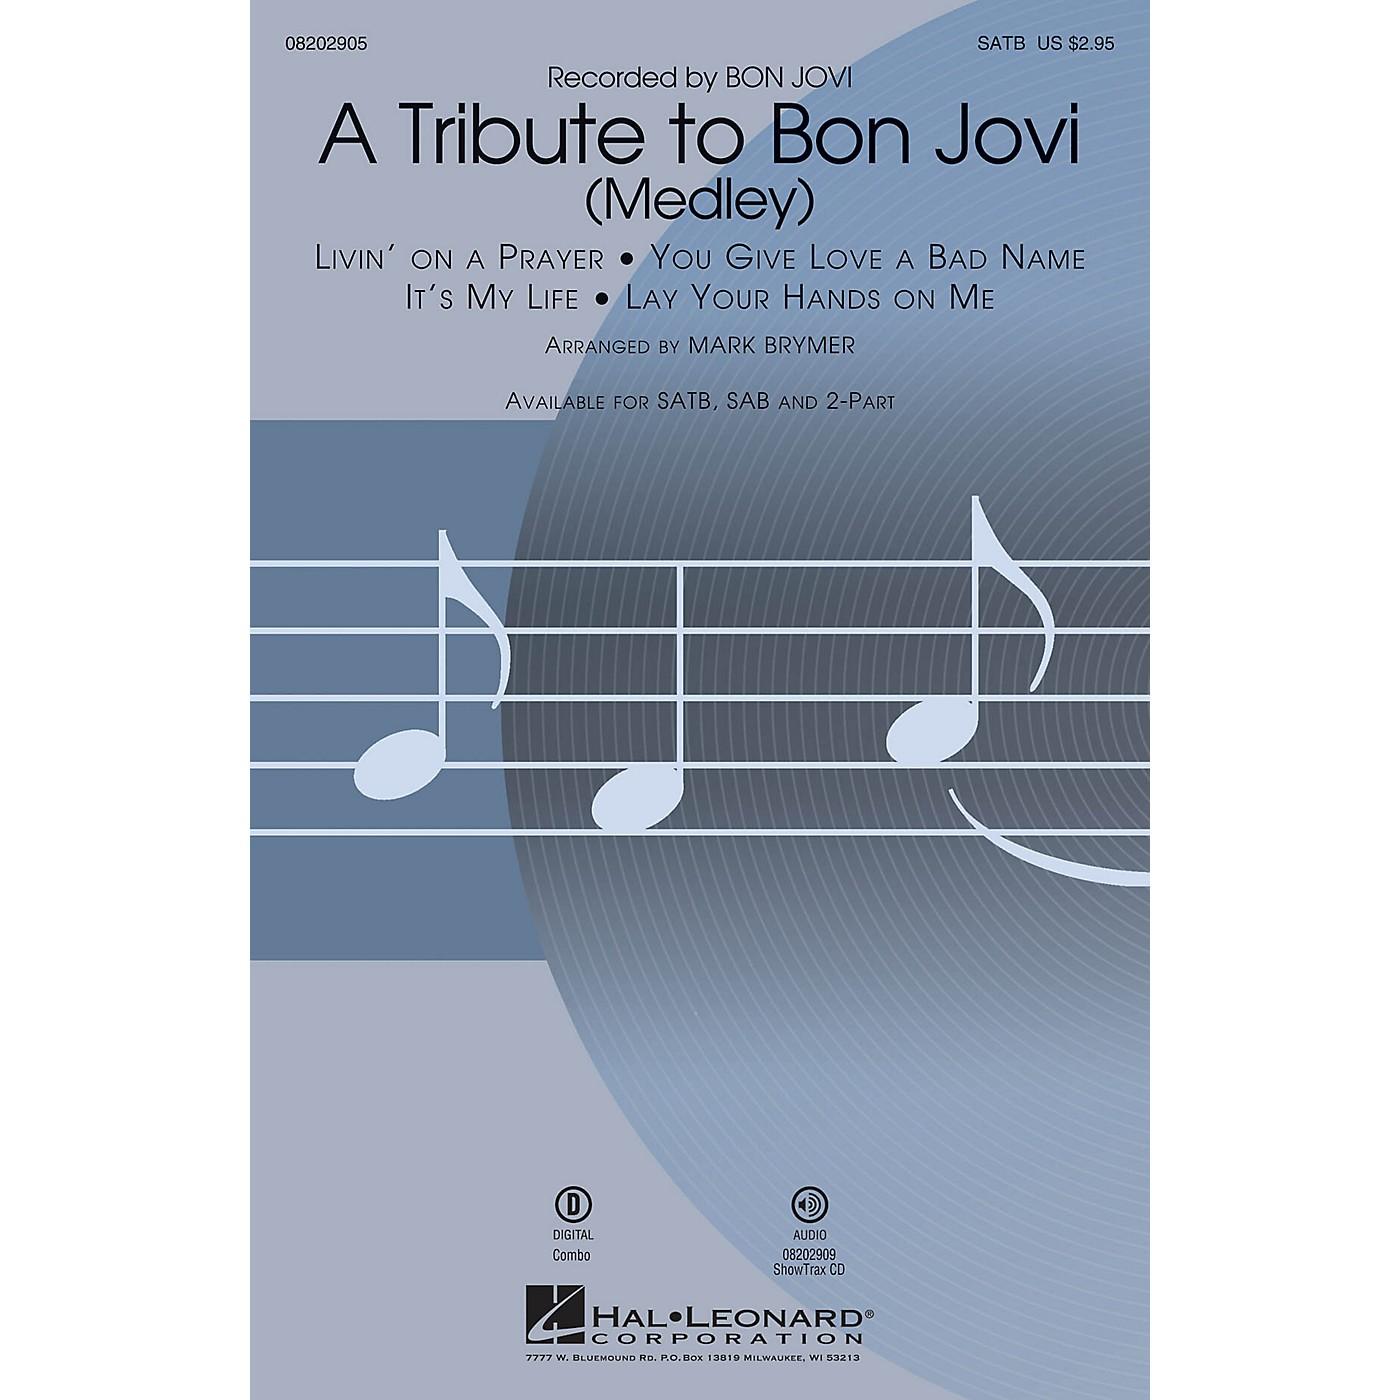 Hal Leonard A Tribute to Bon Jovi (Medley) 2-Part by Bon Jovi Arranged by Mark Brymer thumbnail